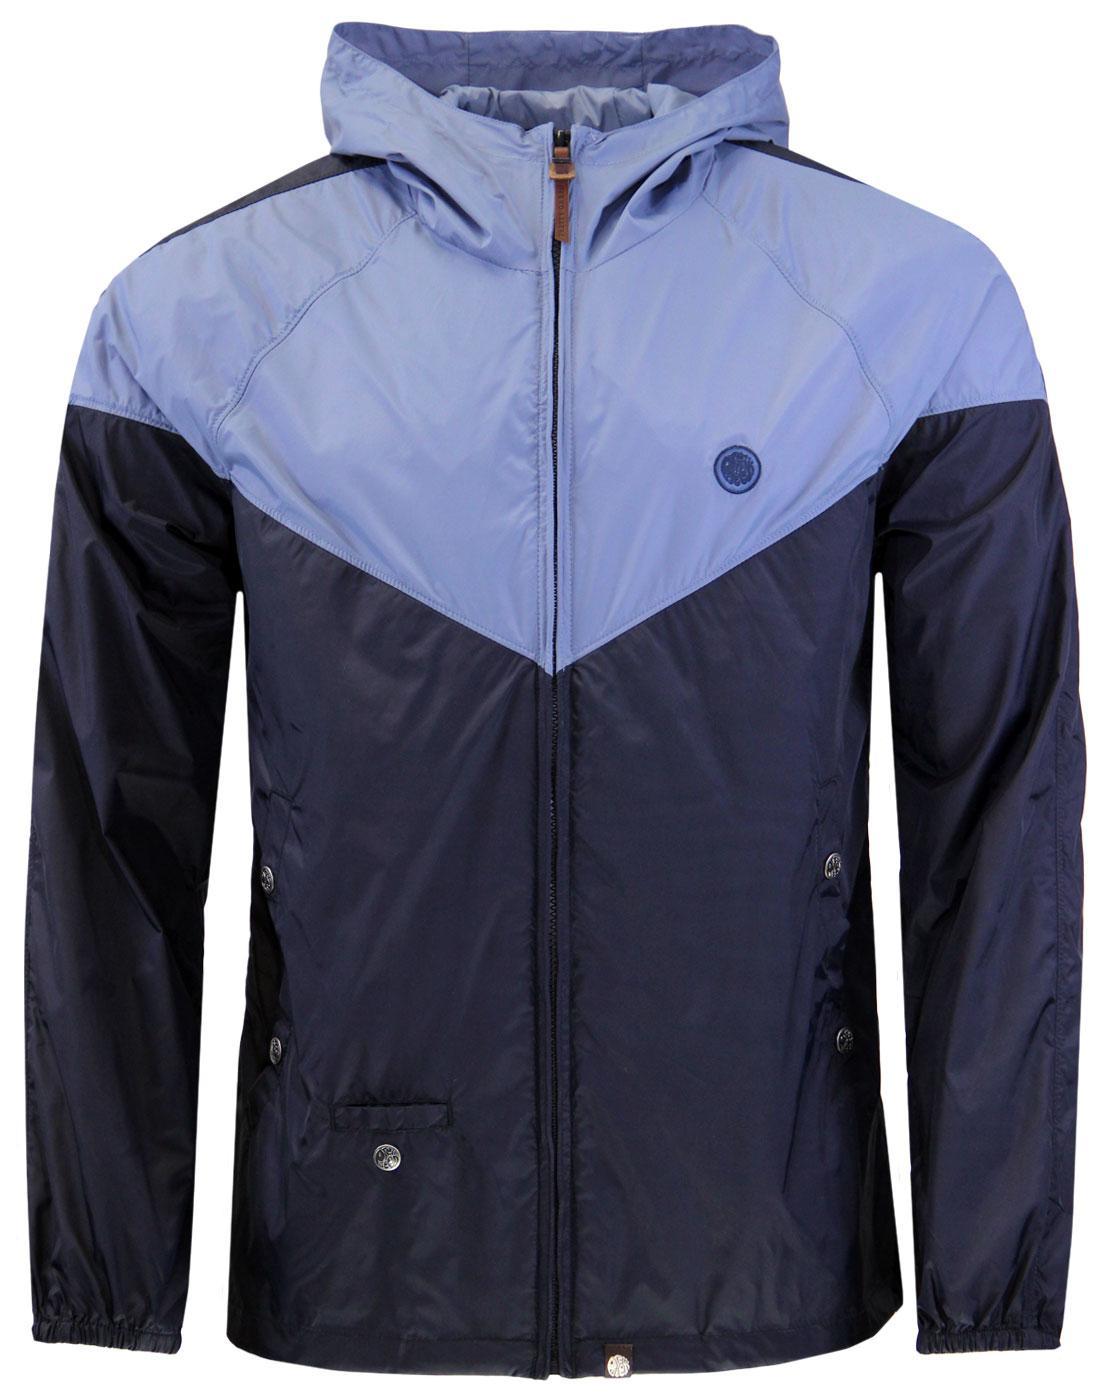 Reedbank PRETTY GREEN Contrast Anorak Jacket (B)